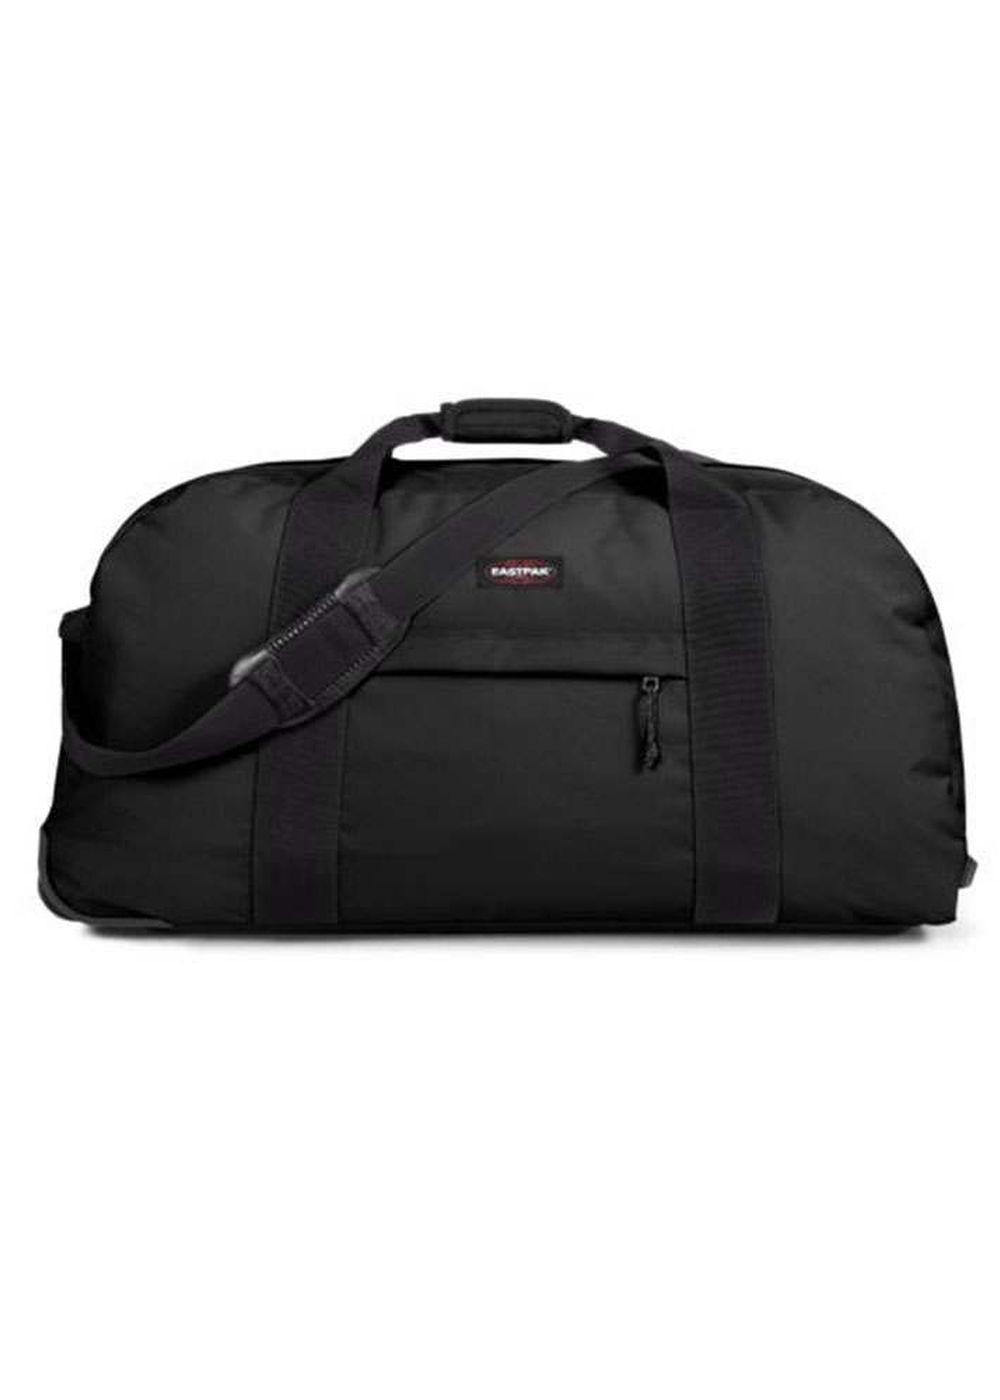 eastpak warehouse duffel bag black